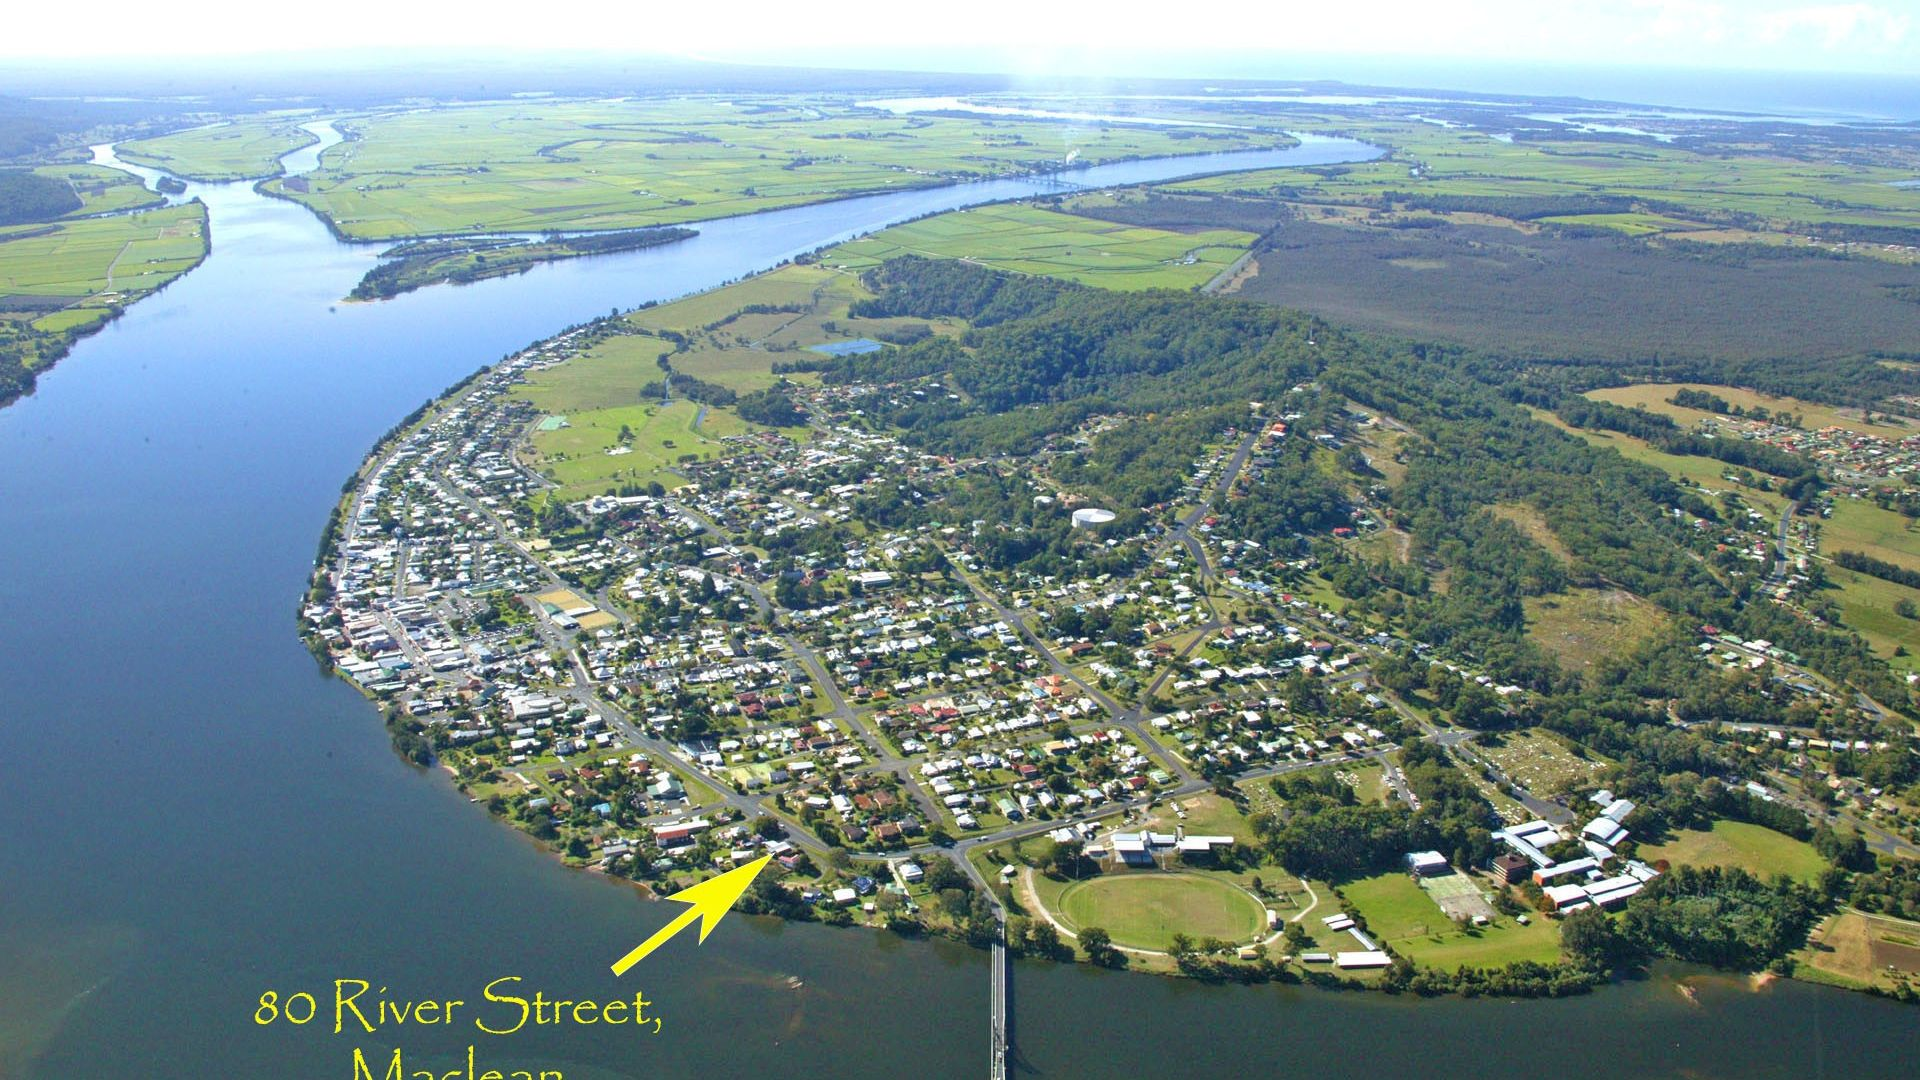 80 River Street, Maclean NSW 2463, Image 1